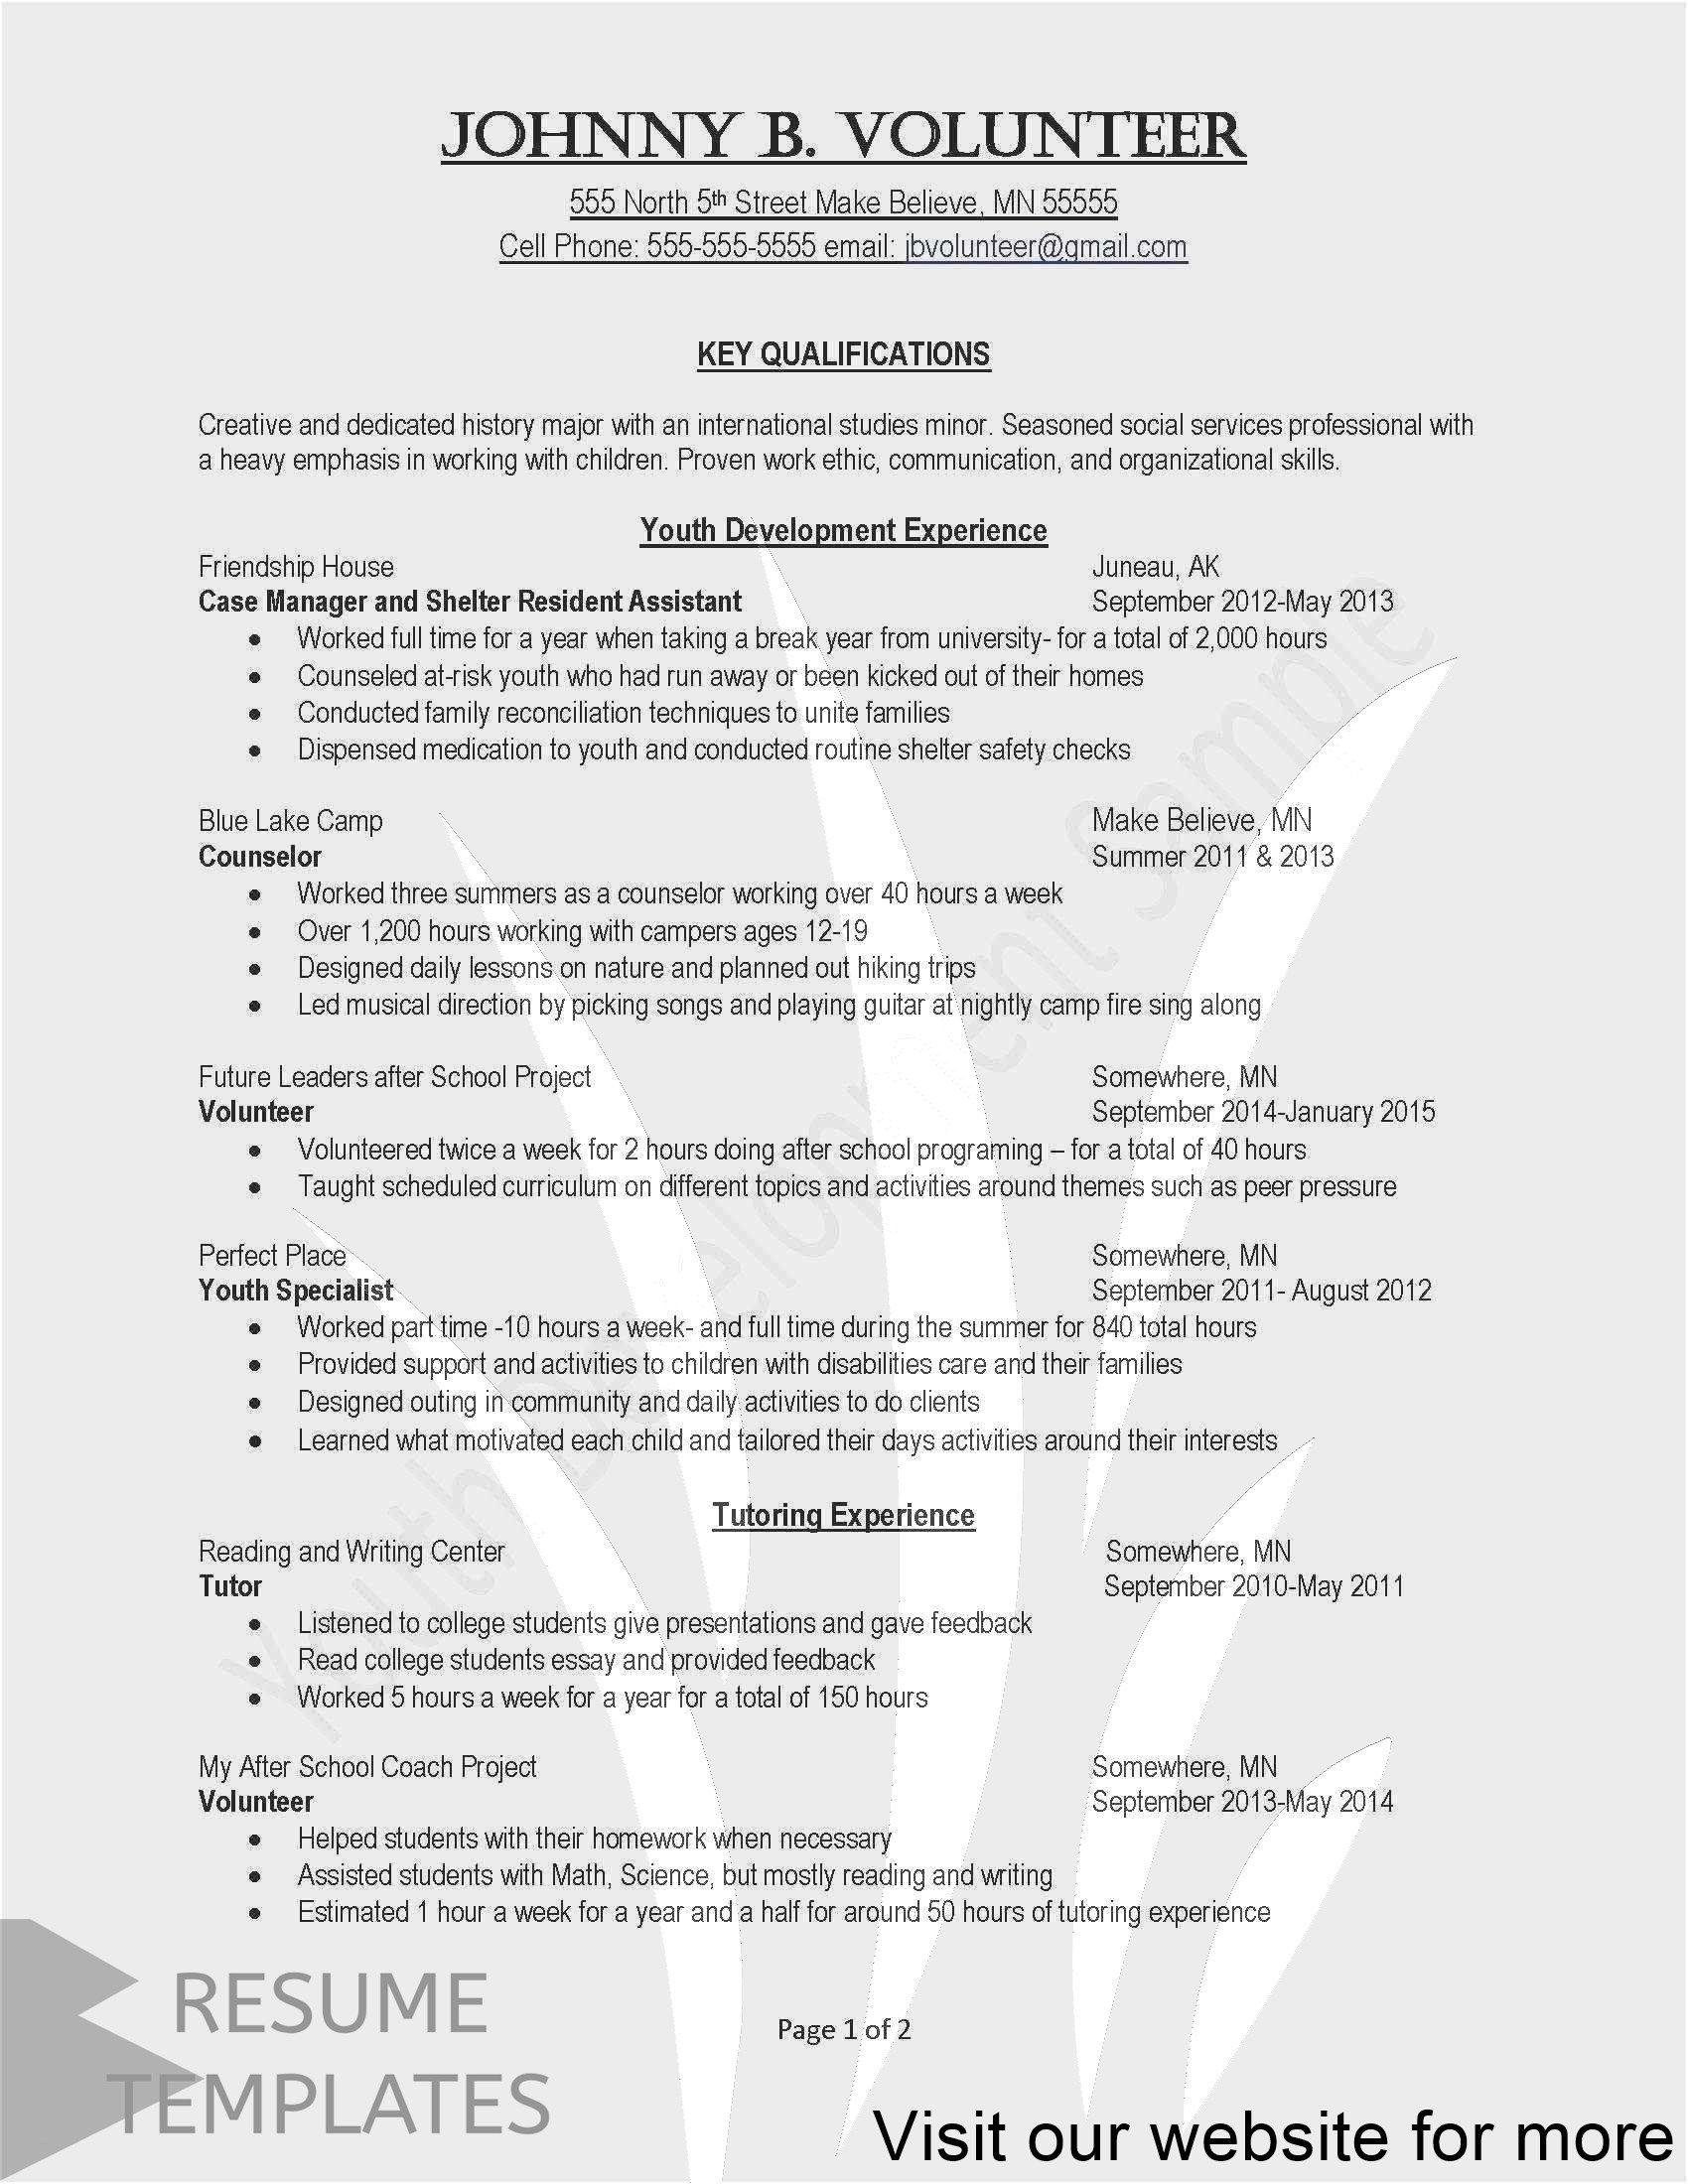 resume template editable Professional in 2020 Resume